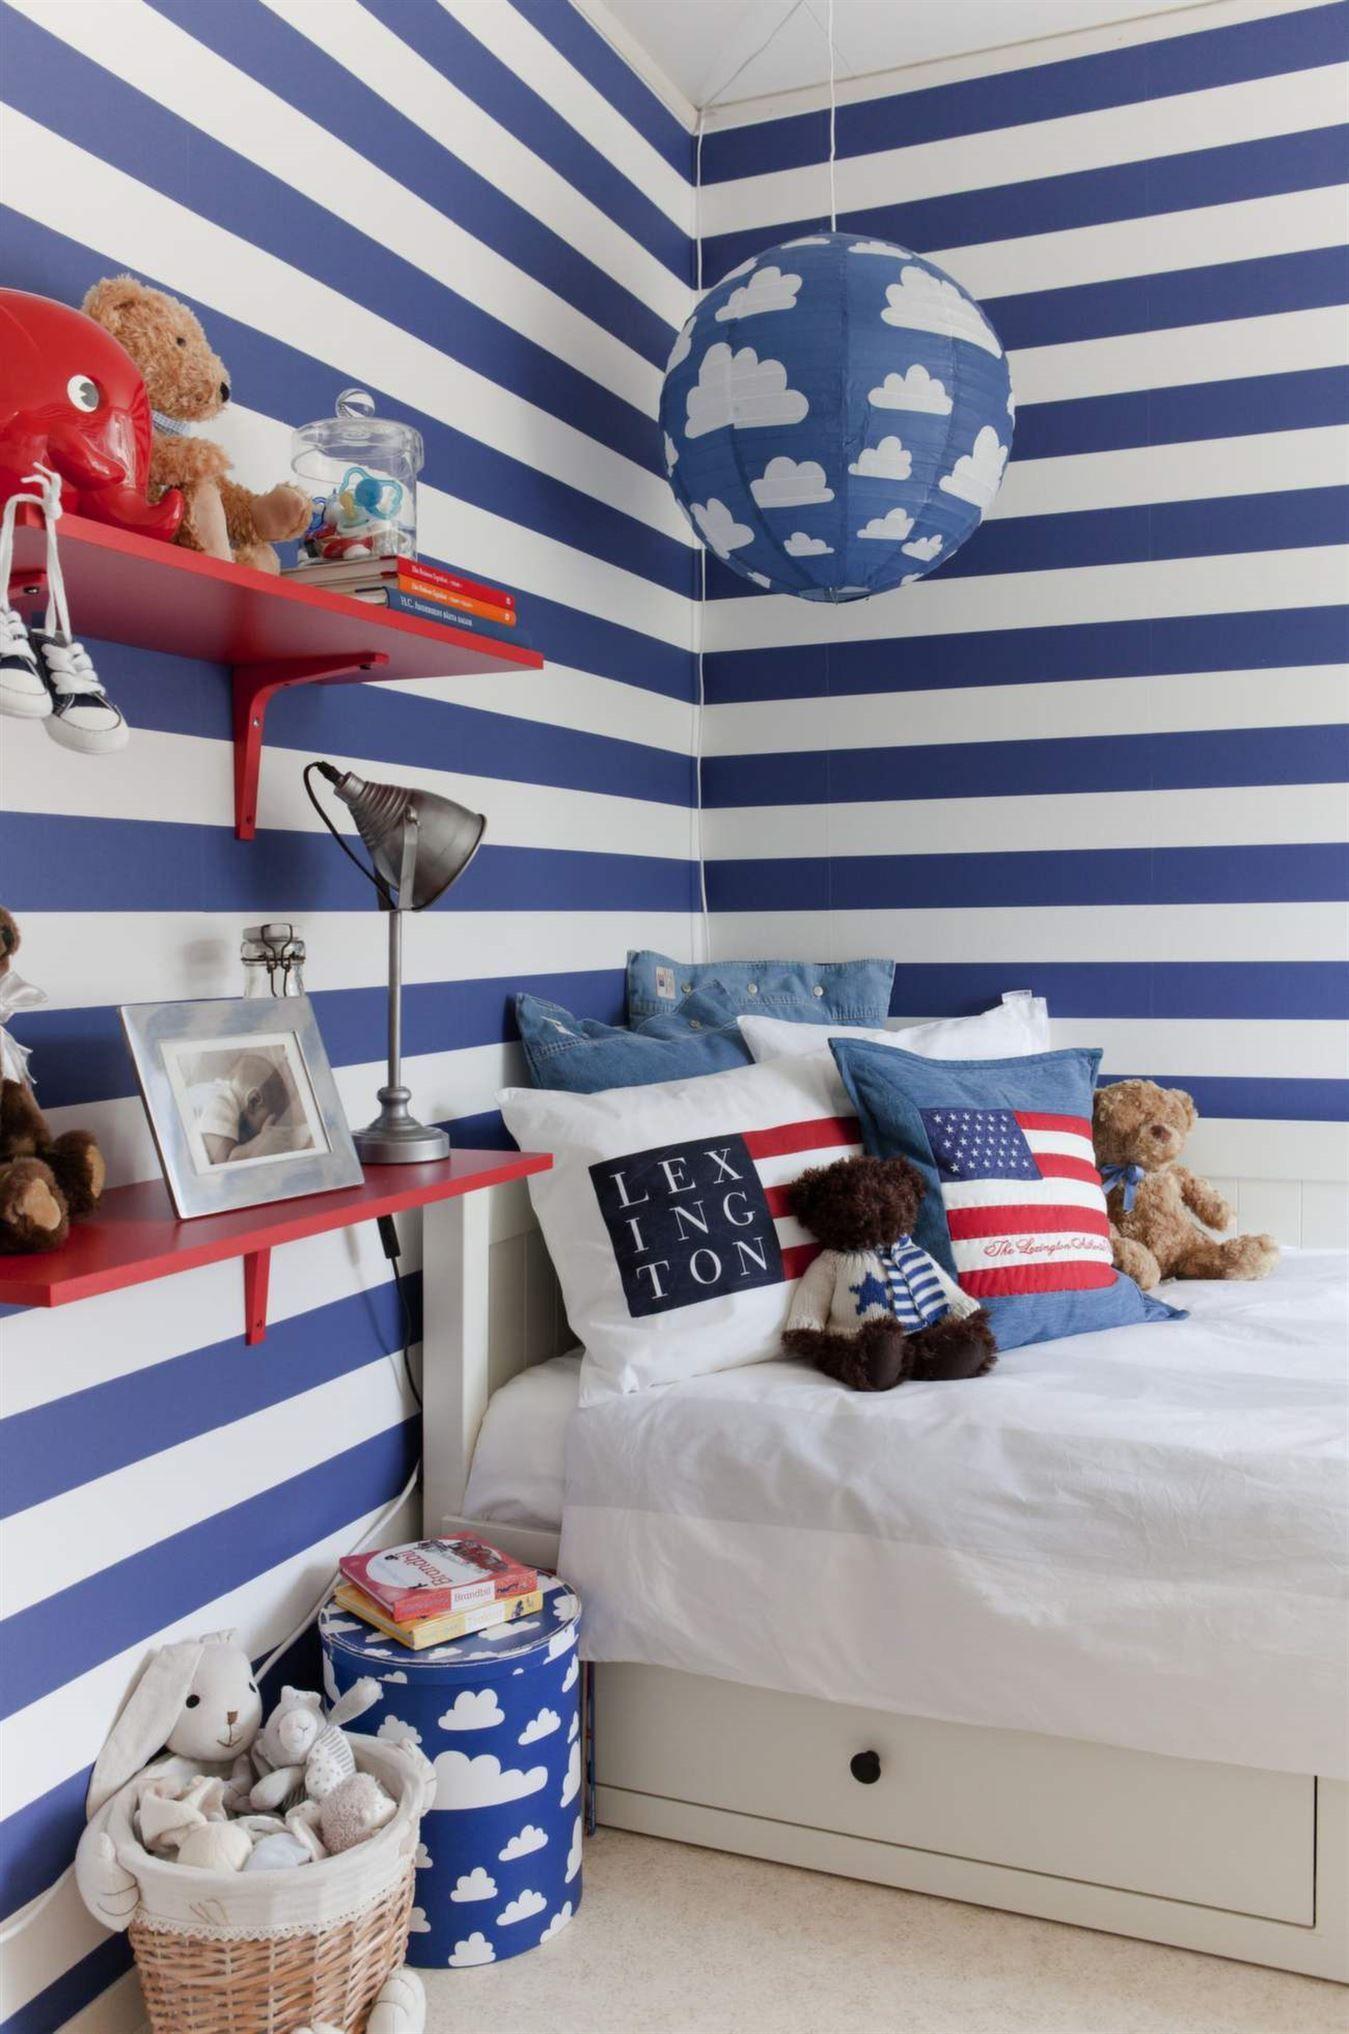 10x10 Bedroom Layout Ikea: Pin On Kids Bedroom